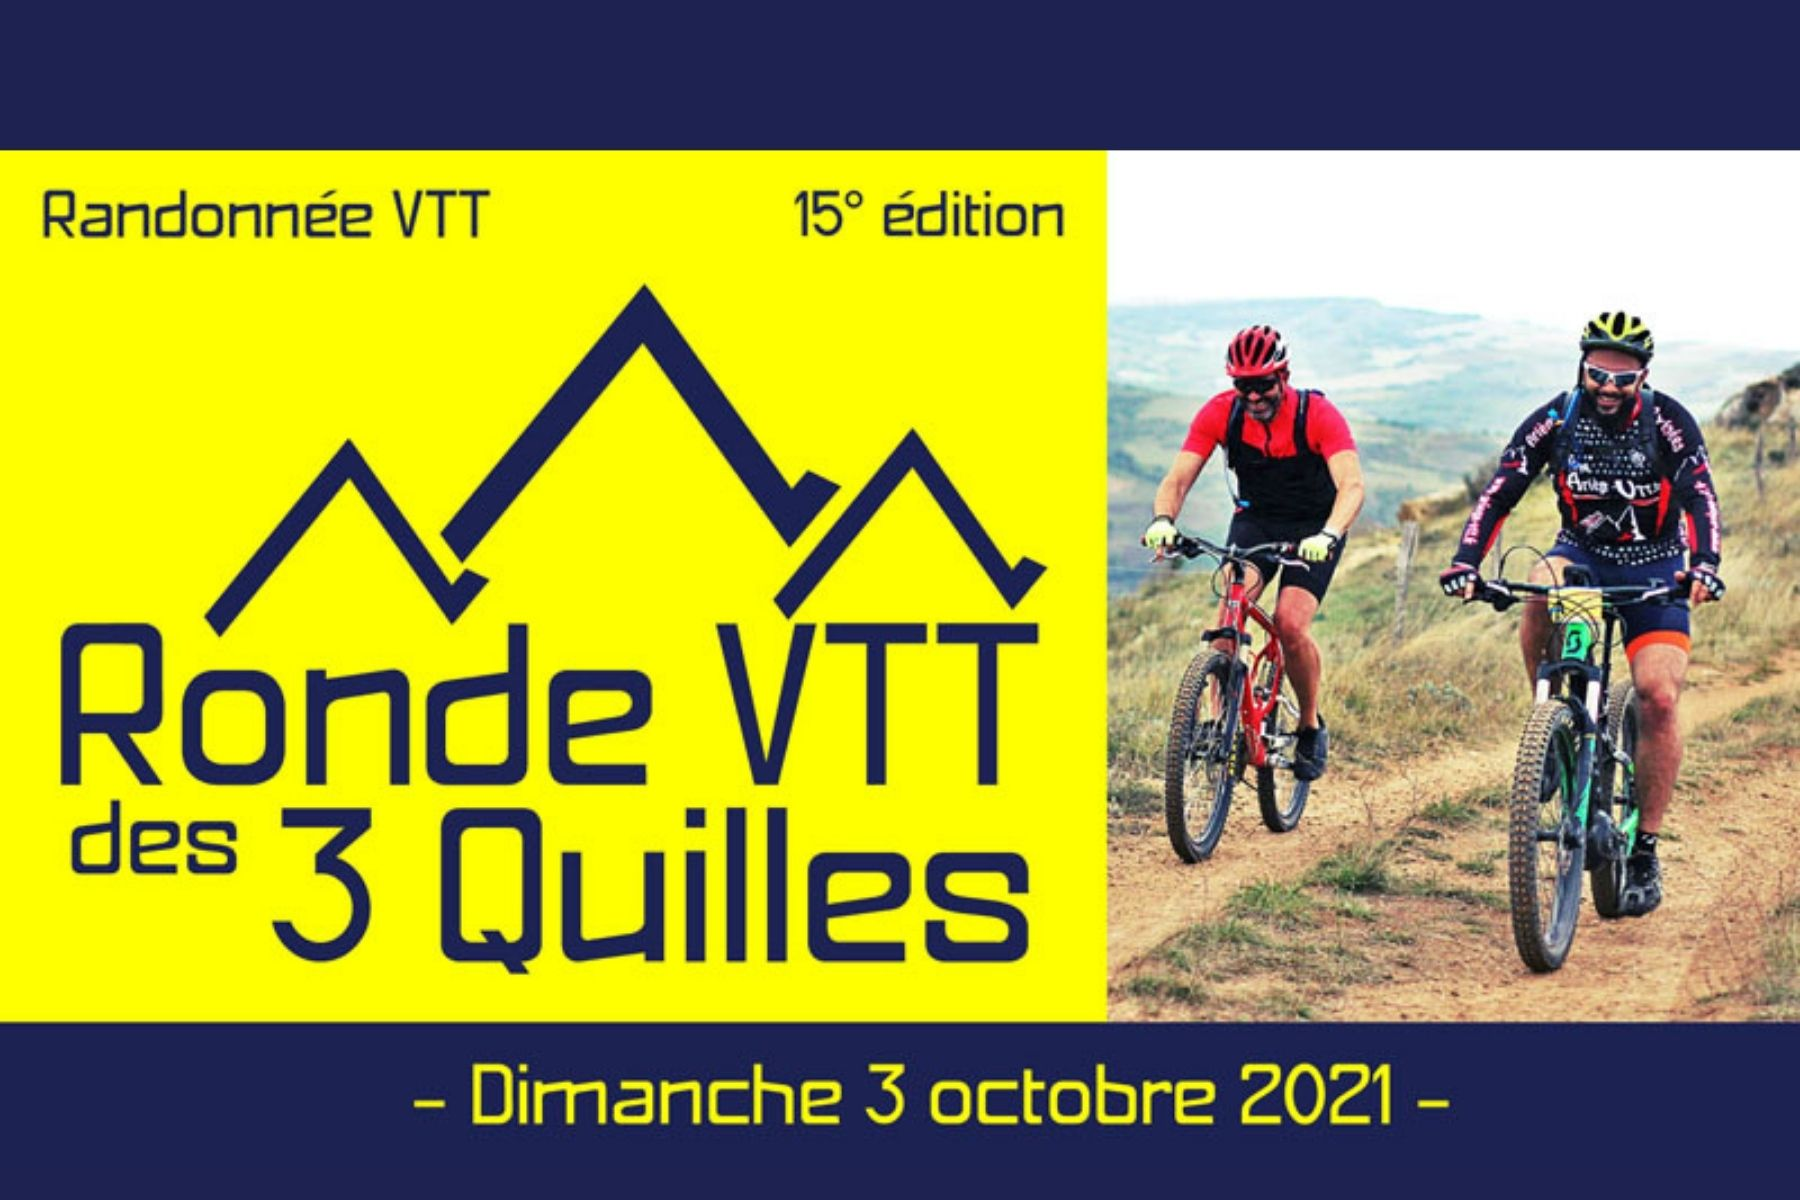 Ronde VTT des 3 Quilles